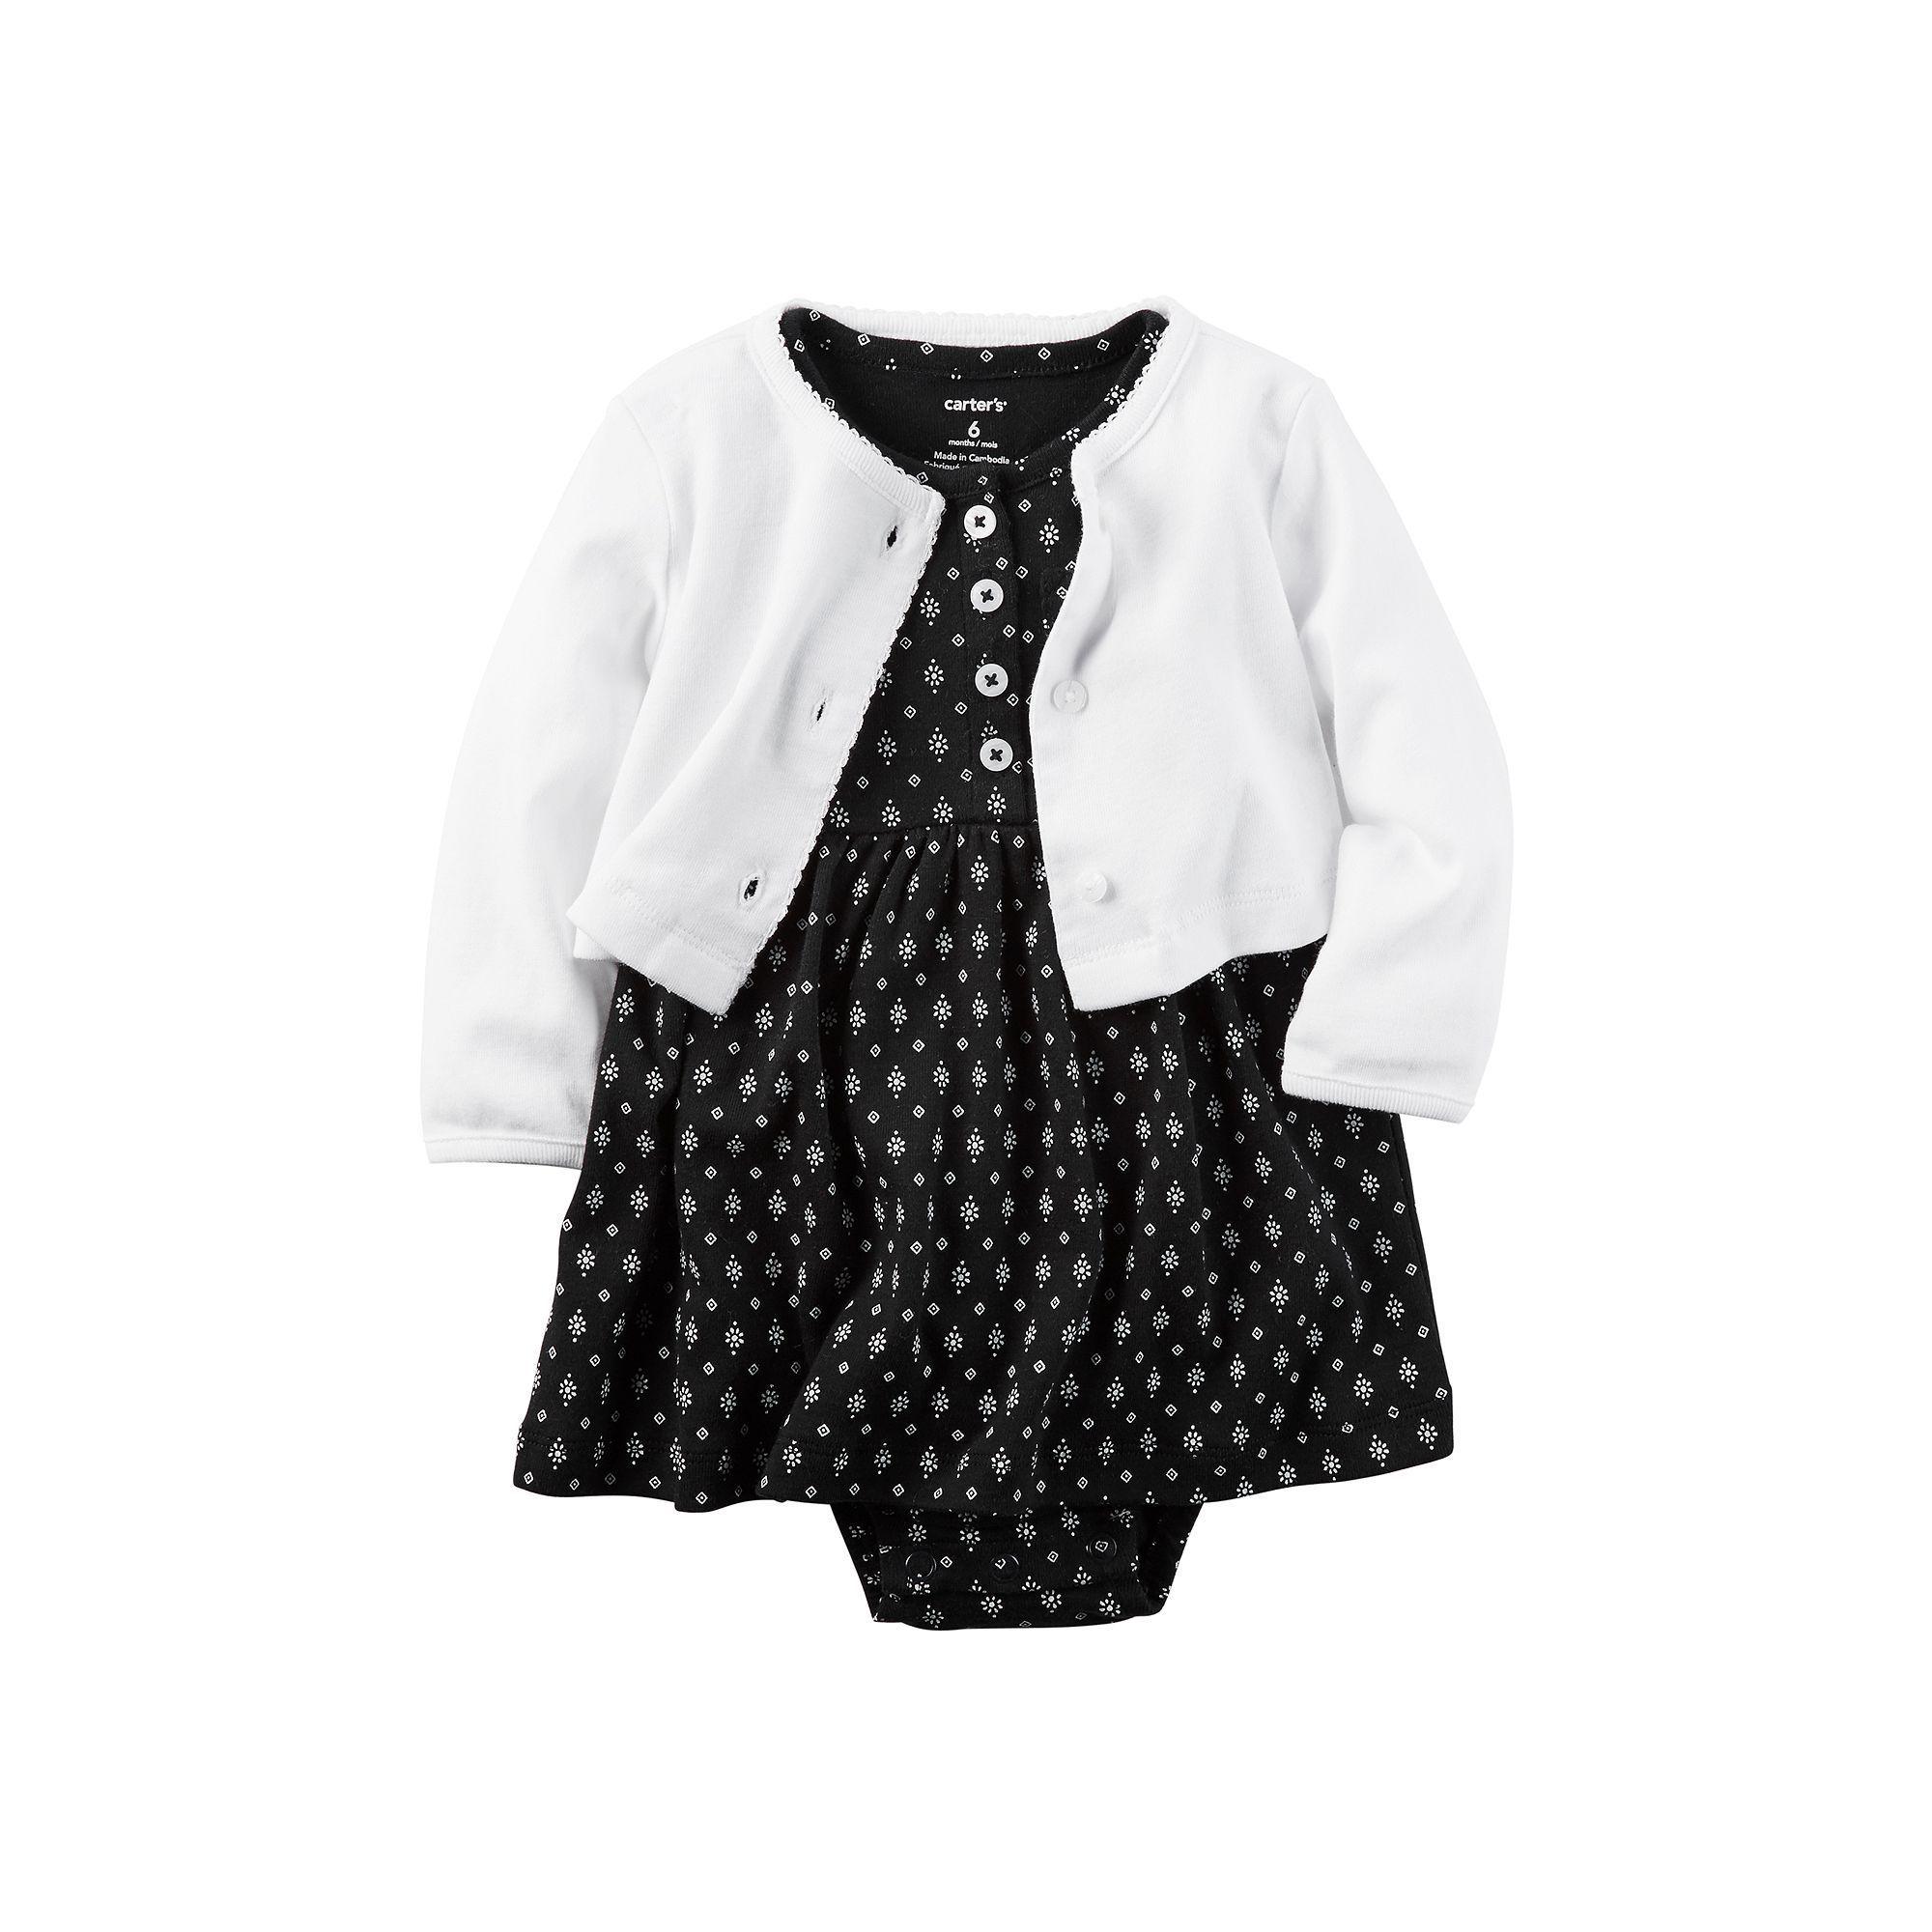 Baby Girl Carter s Bodysuit Dress & Cardigan Set Size 3 Months